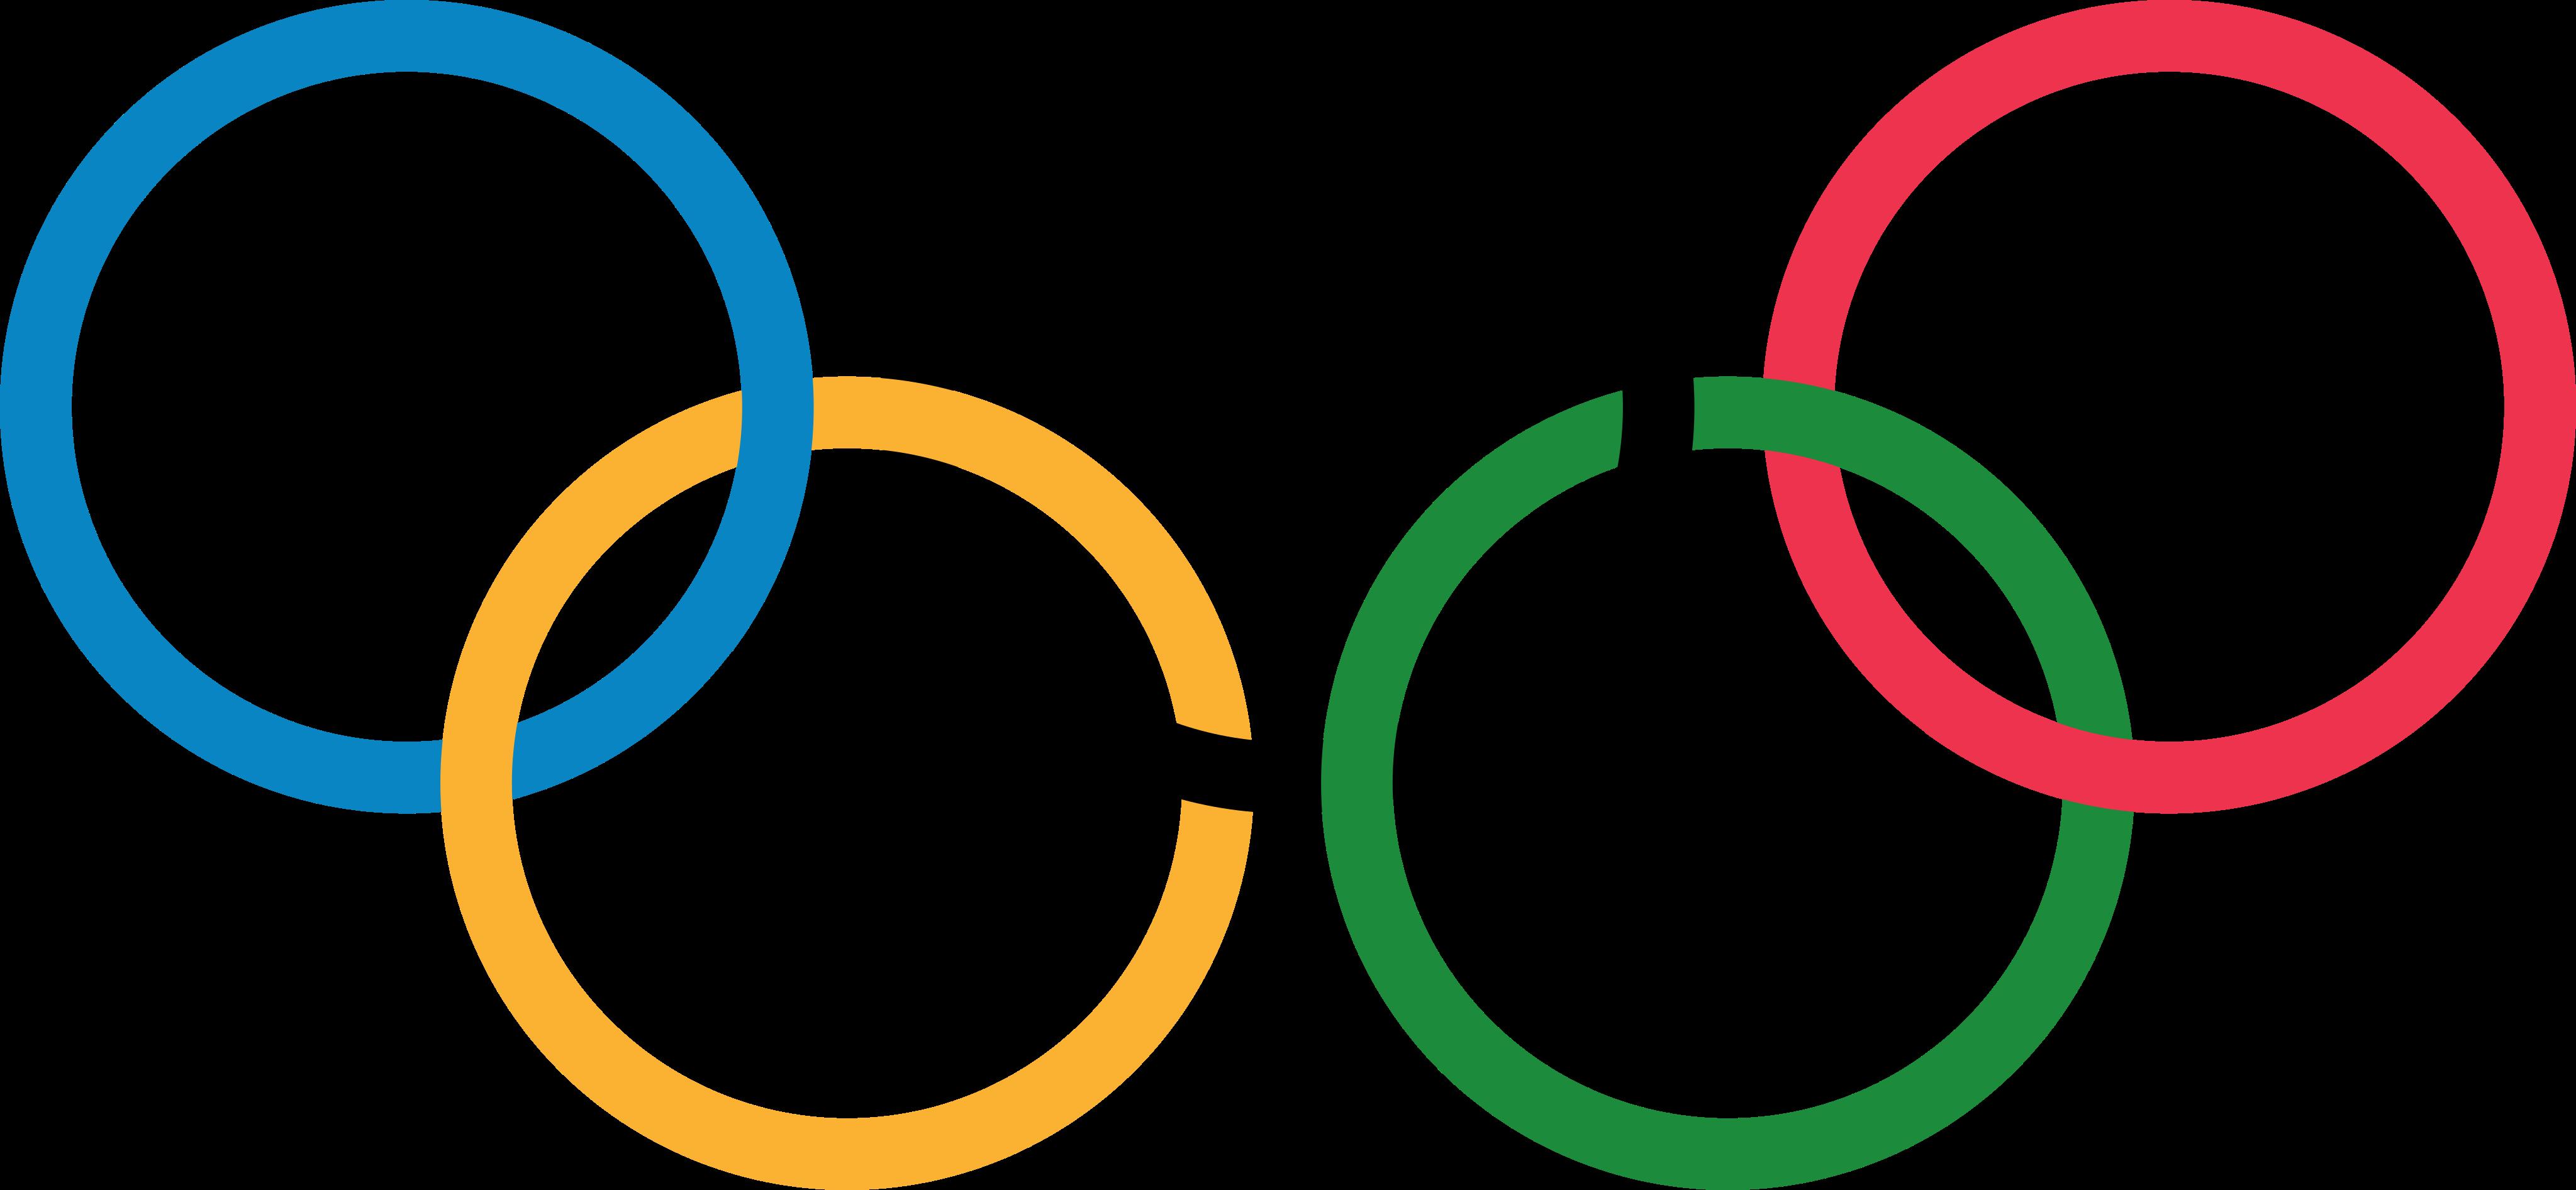 olimpiada olympic games logo - Juegos Olímpicos - Olimpiada Logo